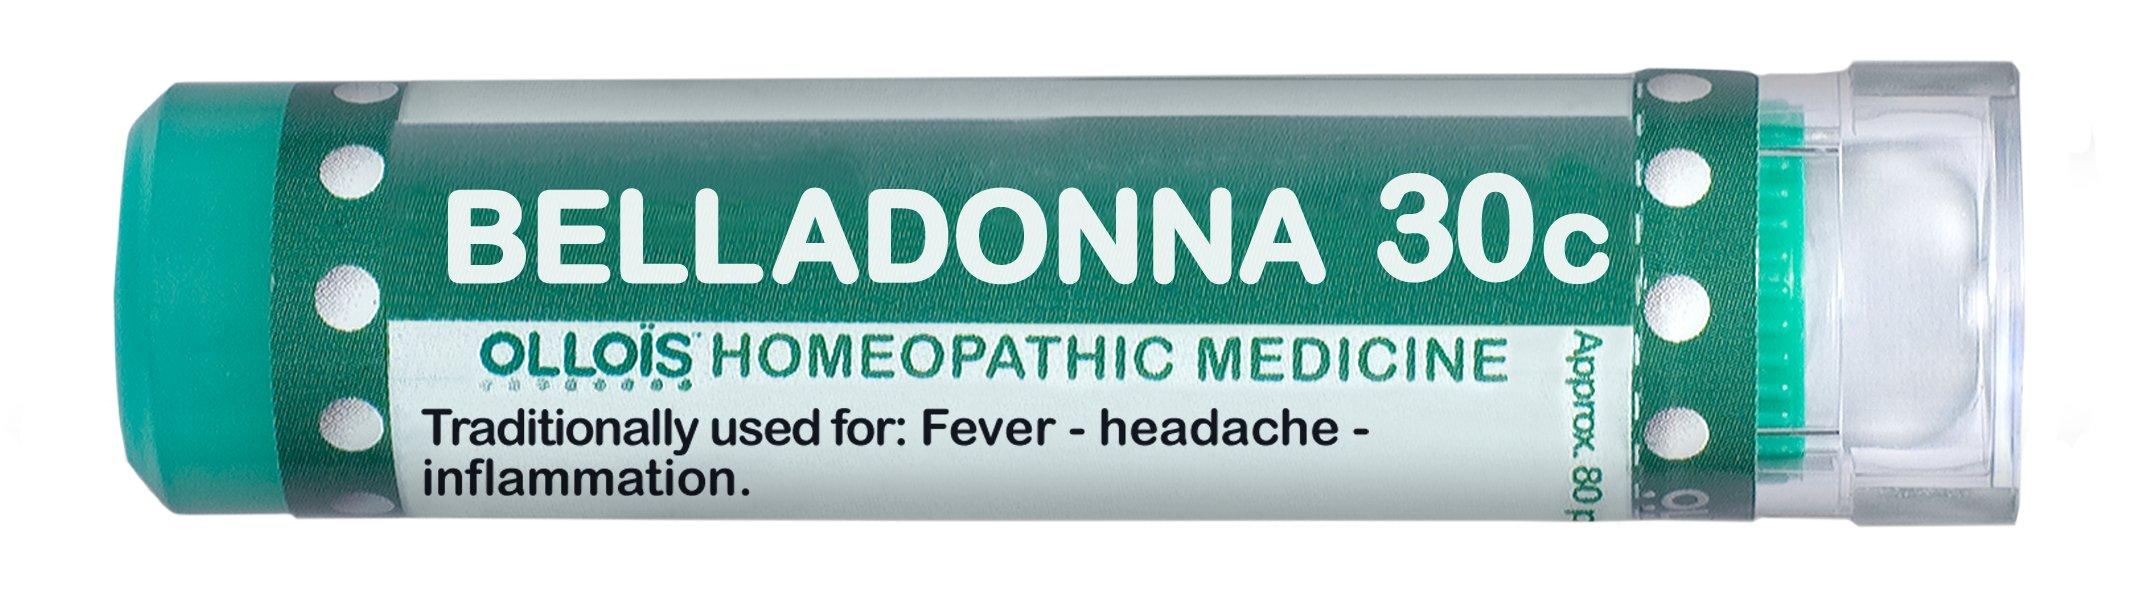 Ollois  Lactose Free Homeopathic Medicines, Belladonna 30C Pellets, 80 Count